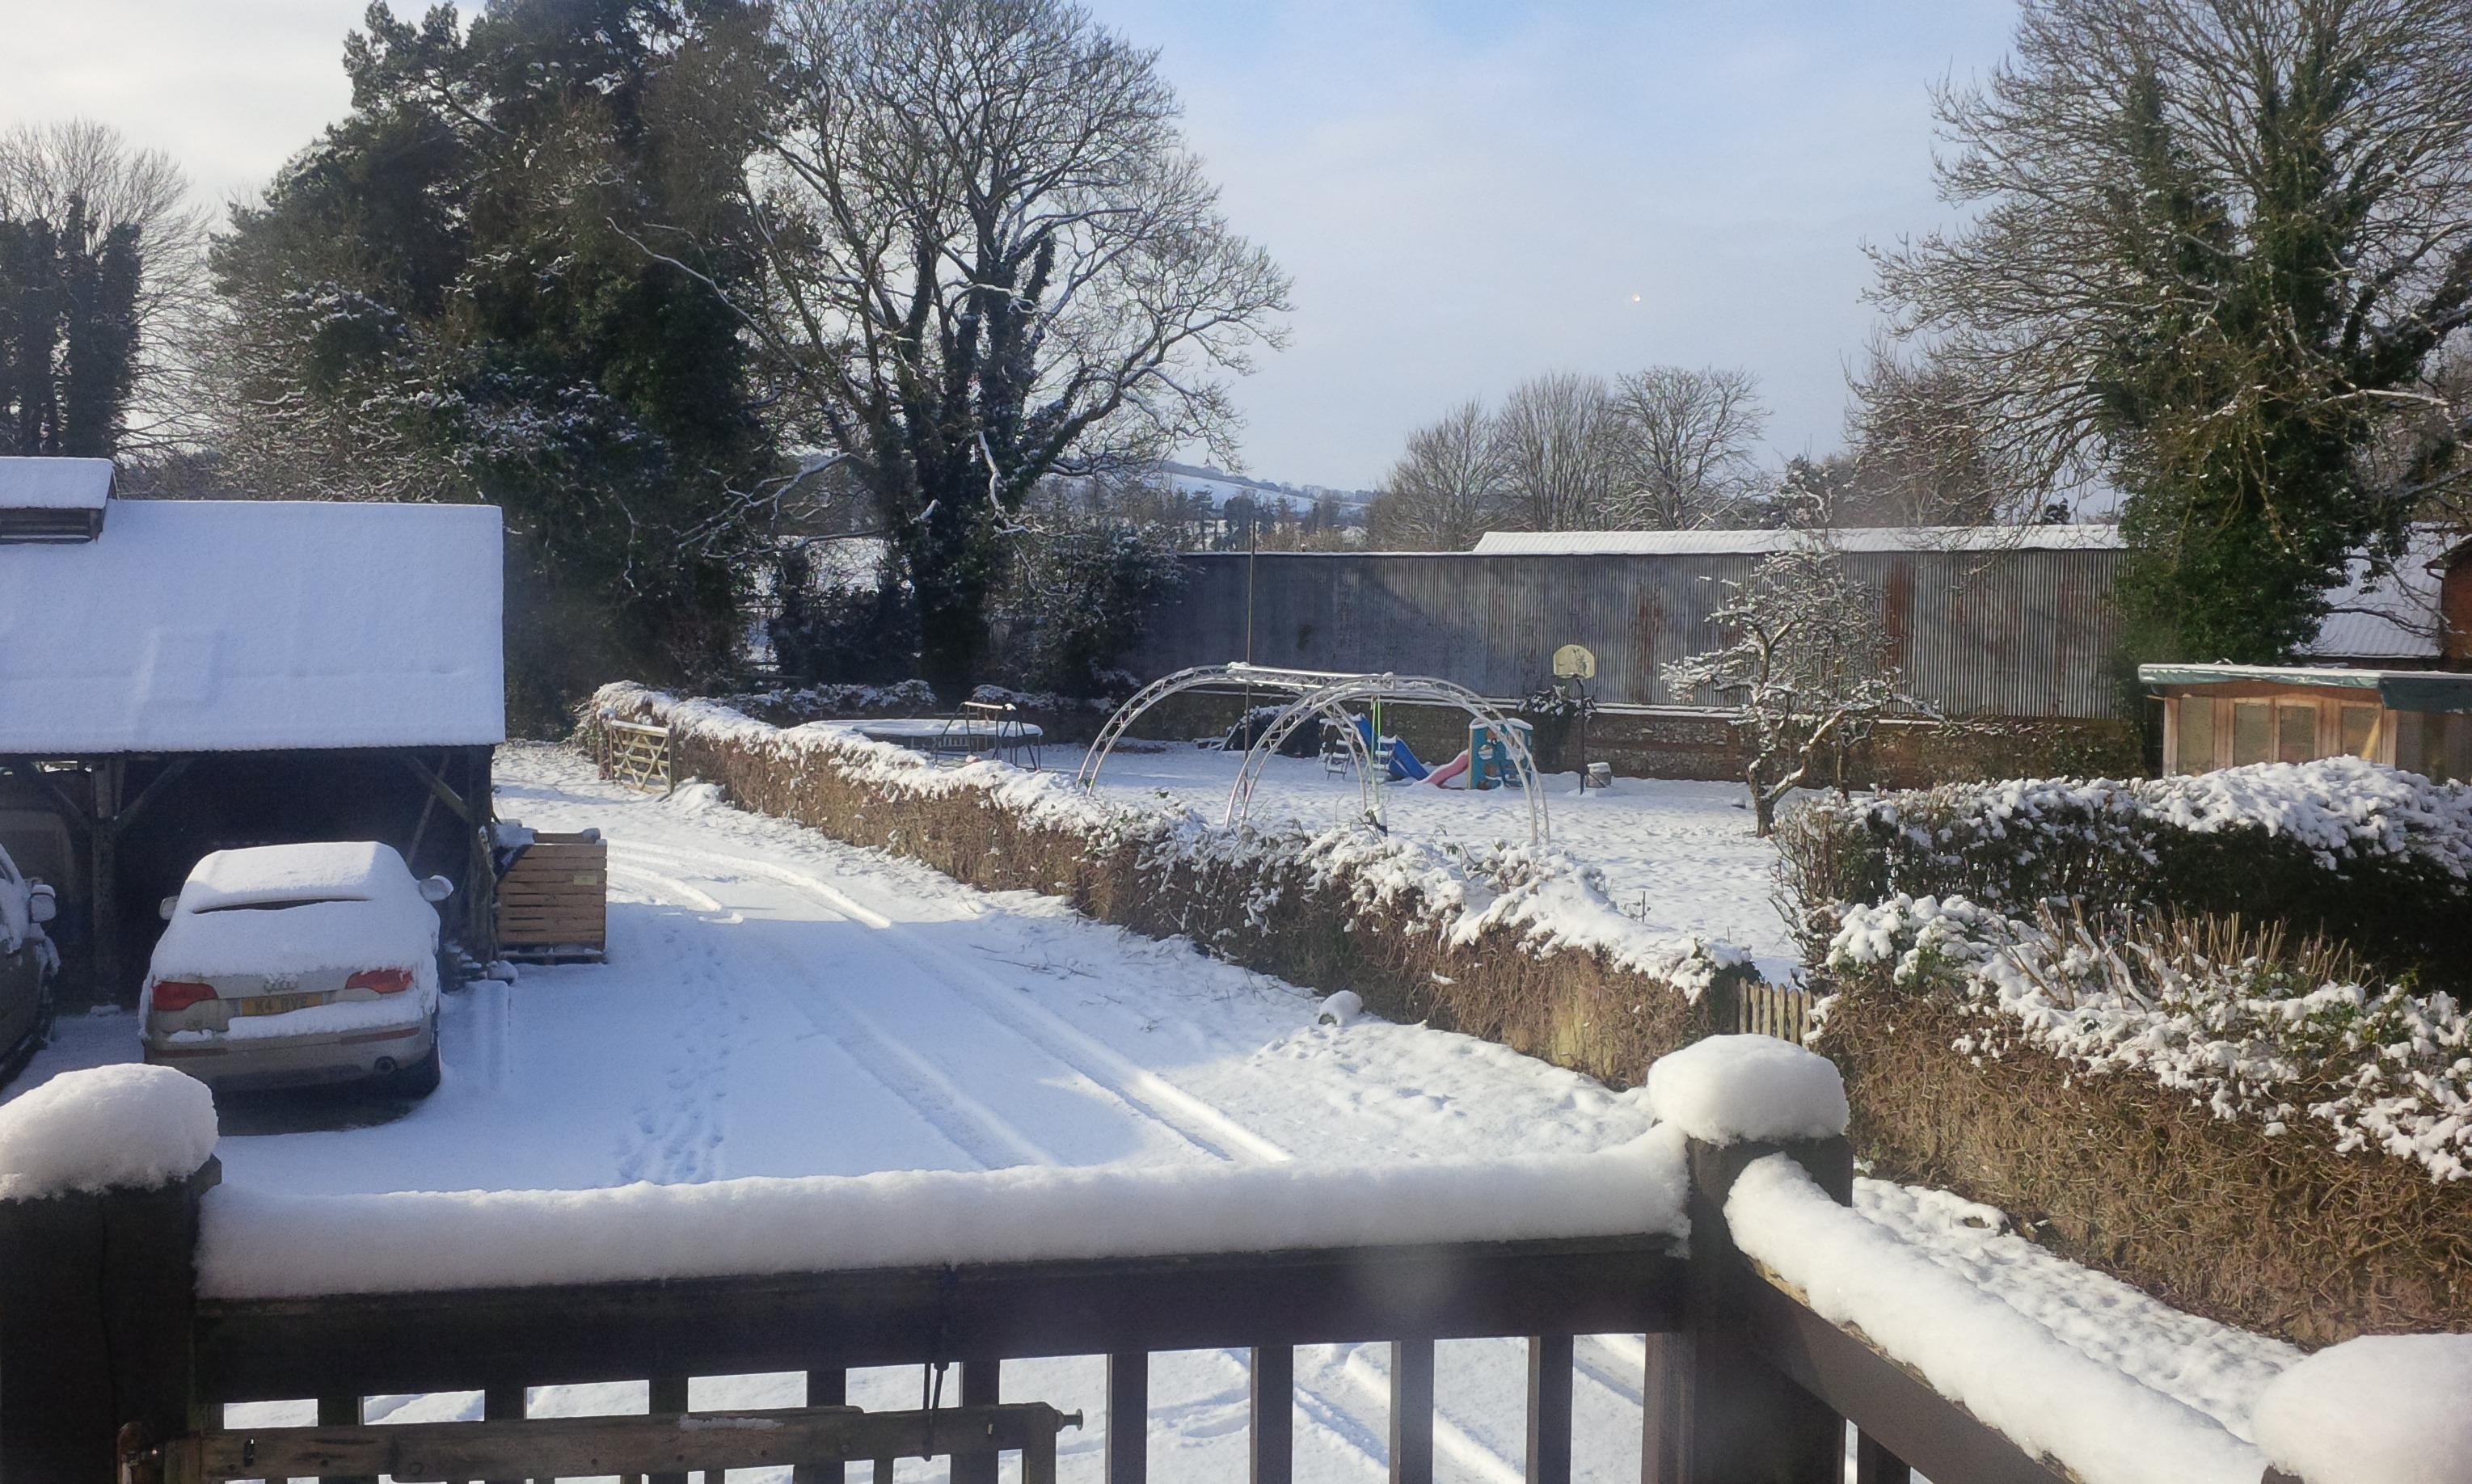 Delichon's premises covered in snow